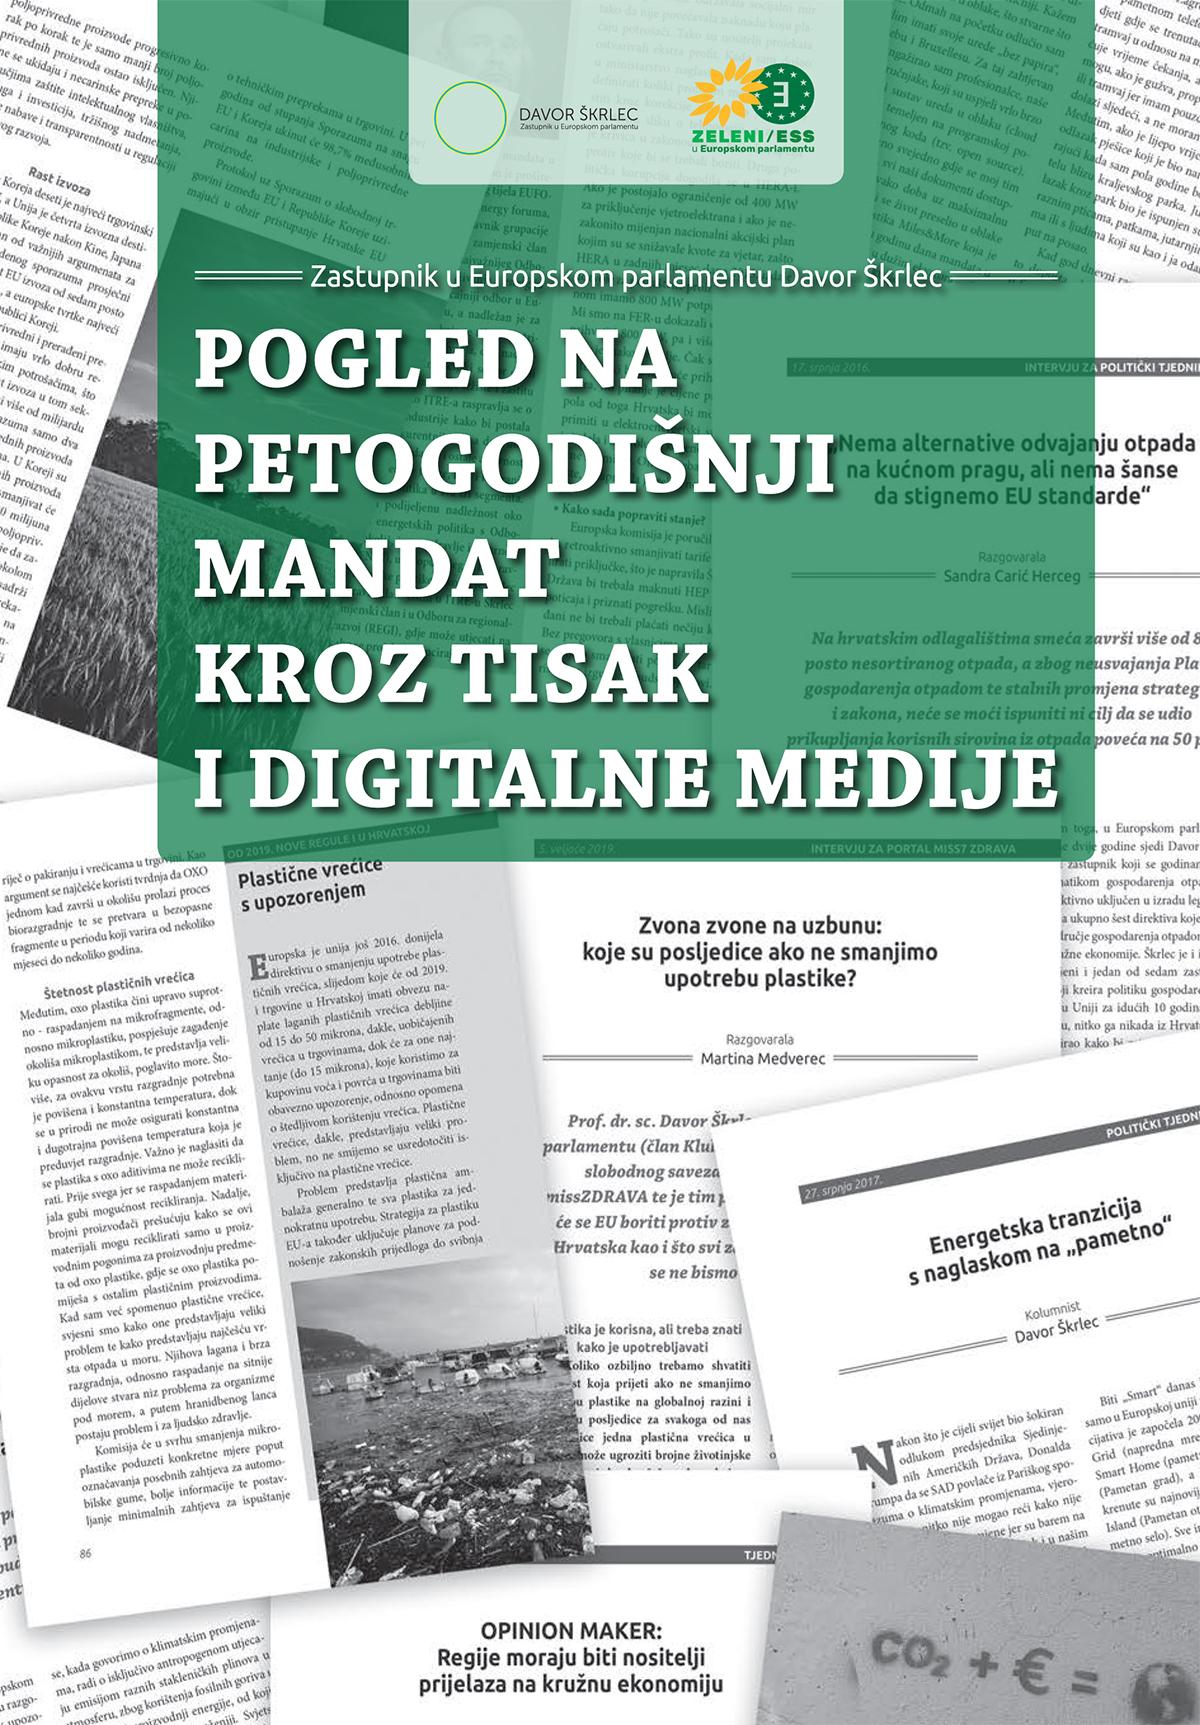 Davor Škrlec Pogled na petogodišnji mandat